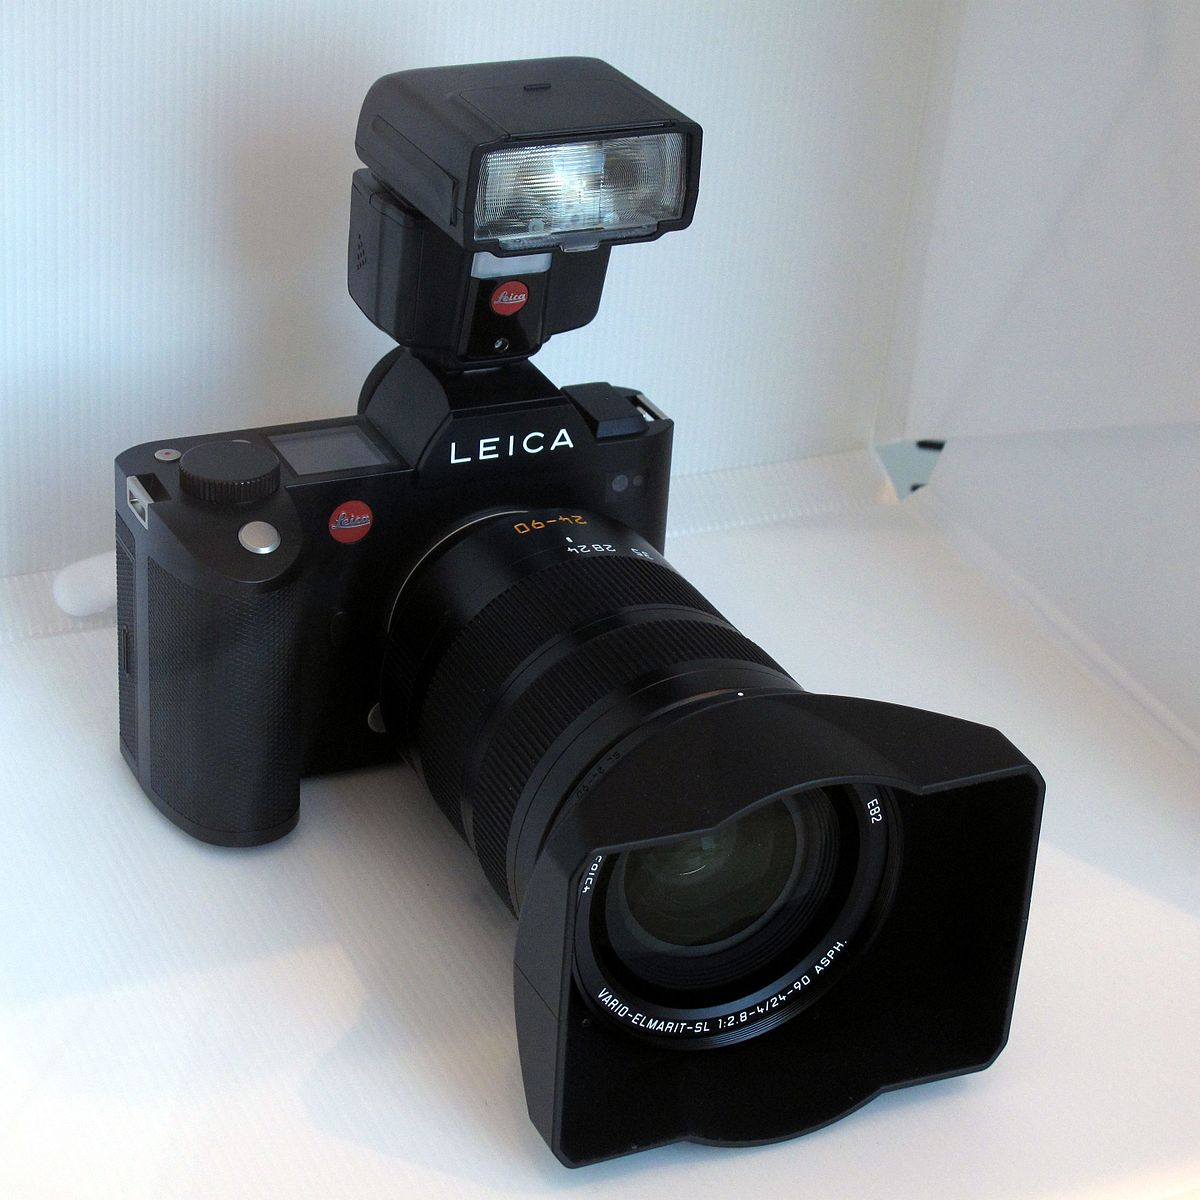 Leica Sl Typ 601 Wikipedia